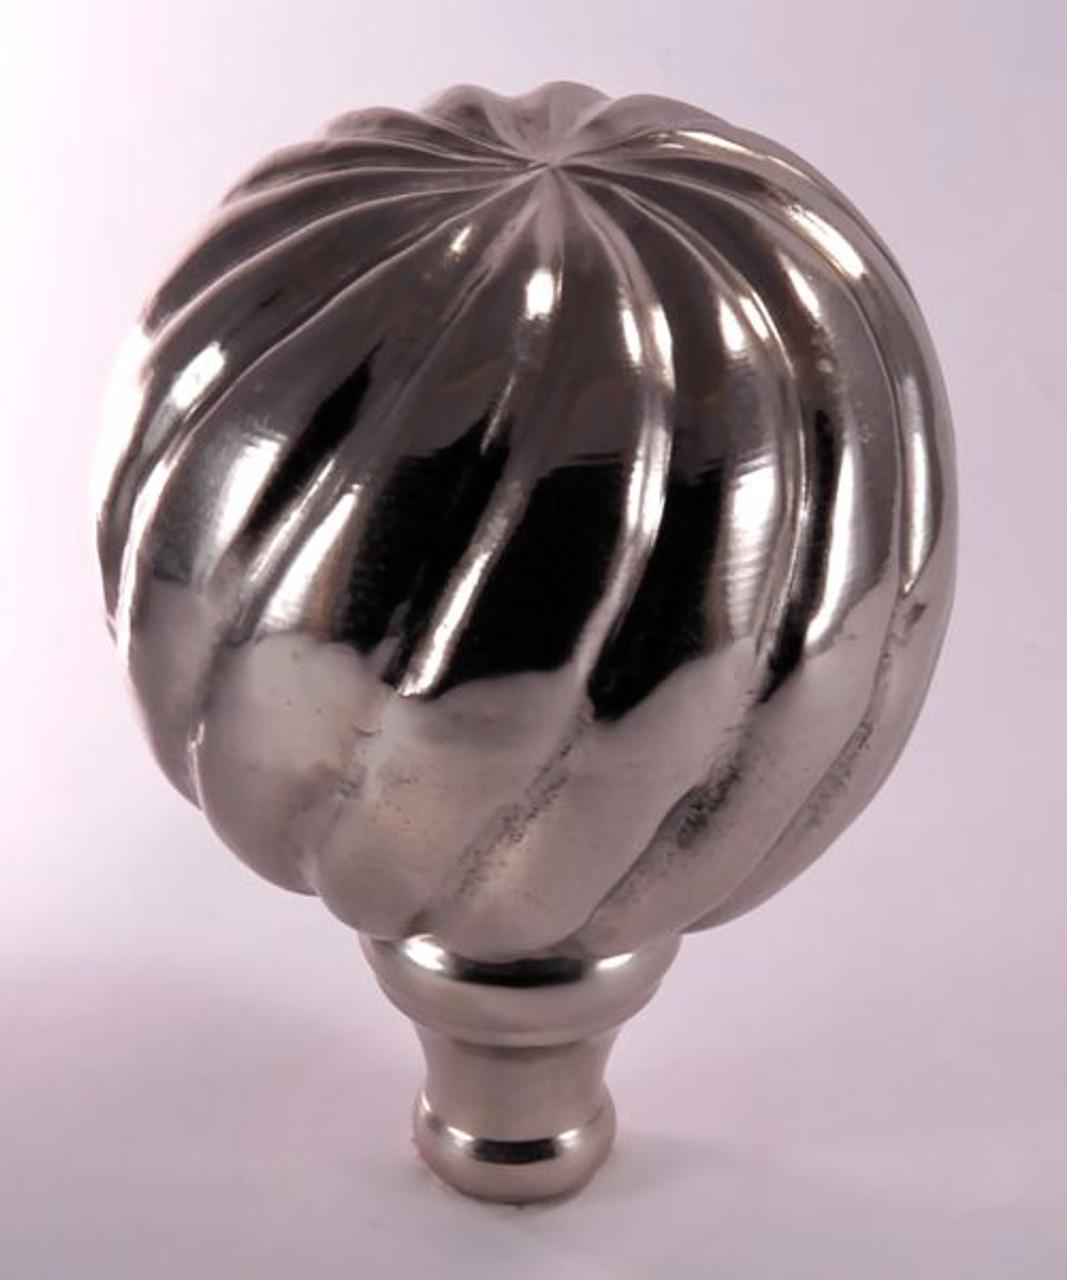 Finial - Small Parisian- Nickel Brushed